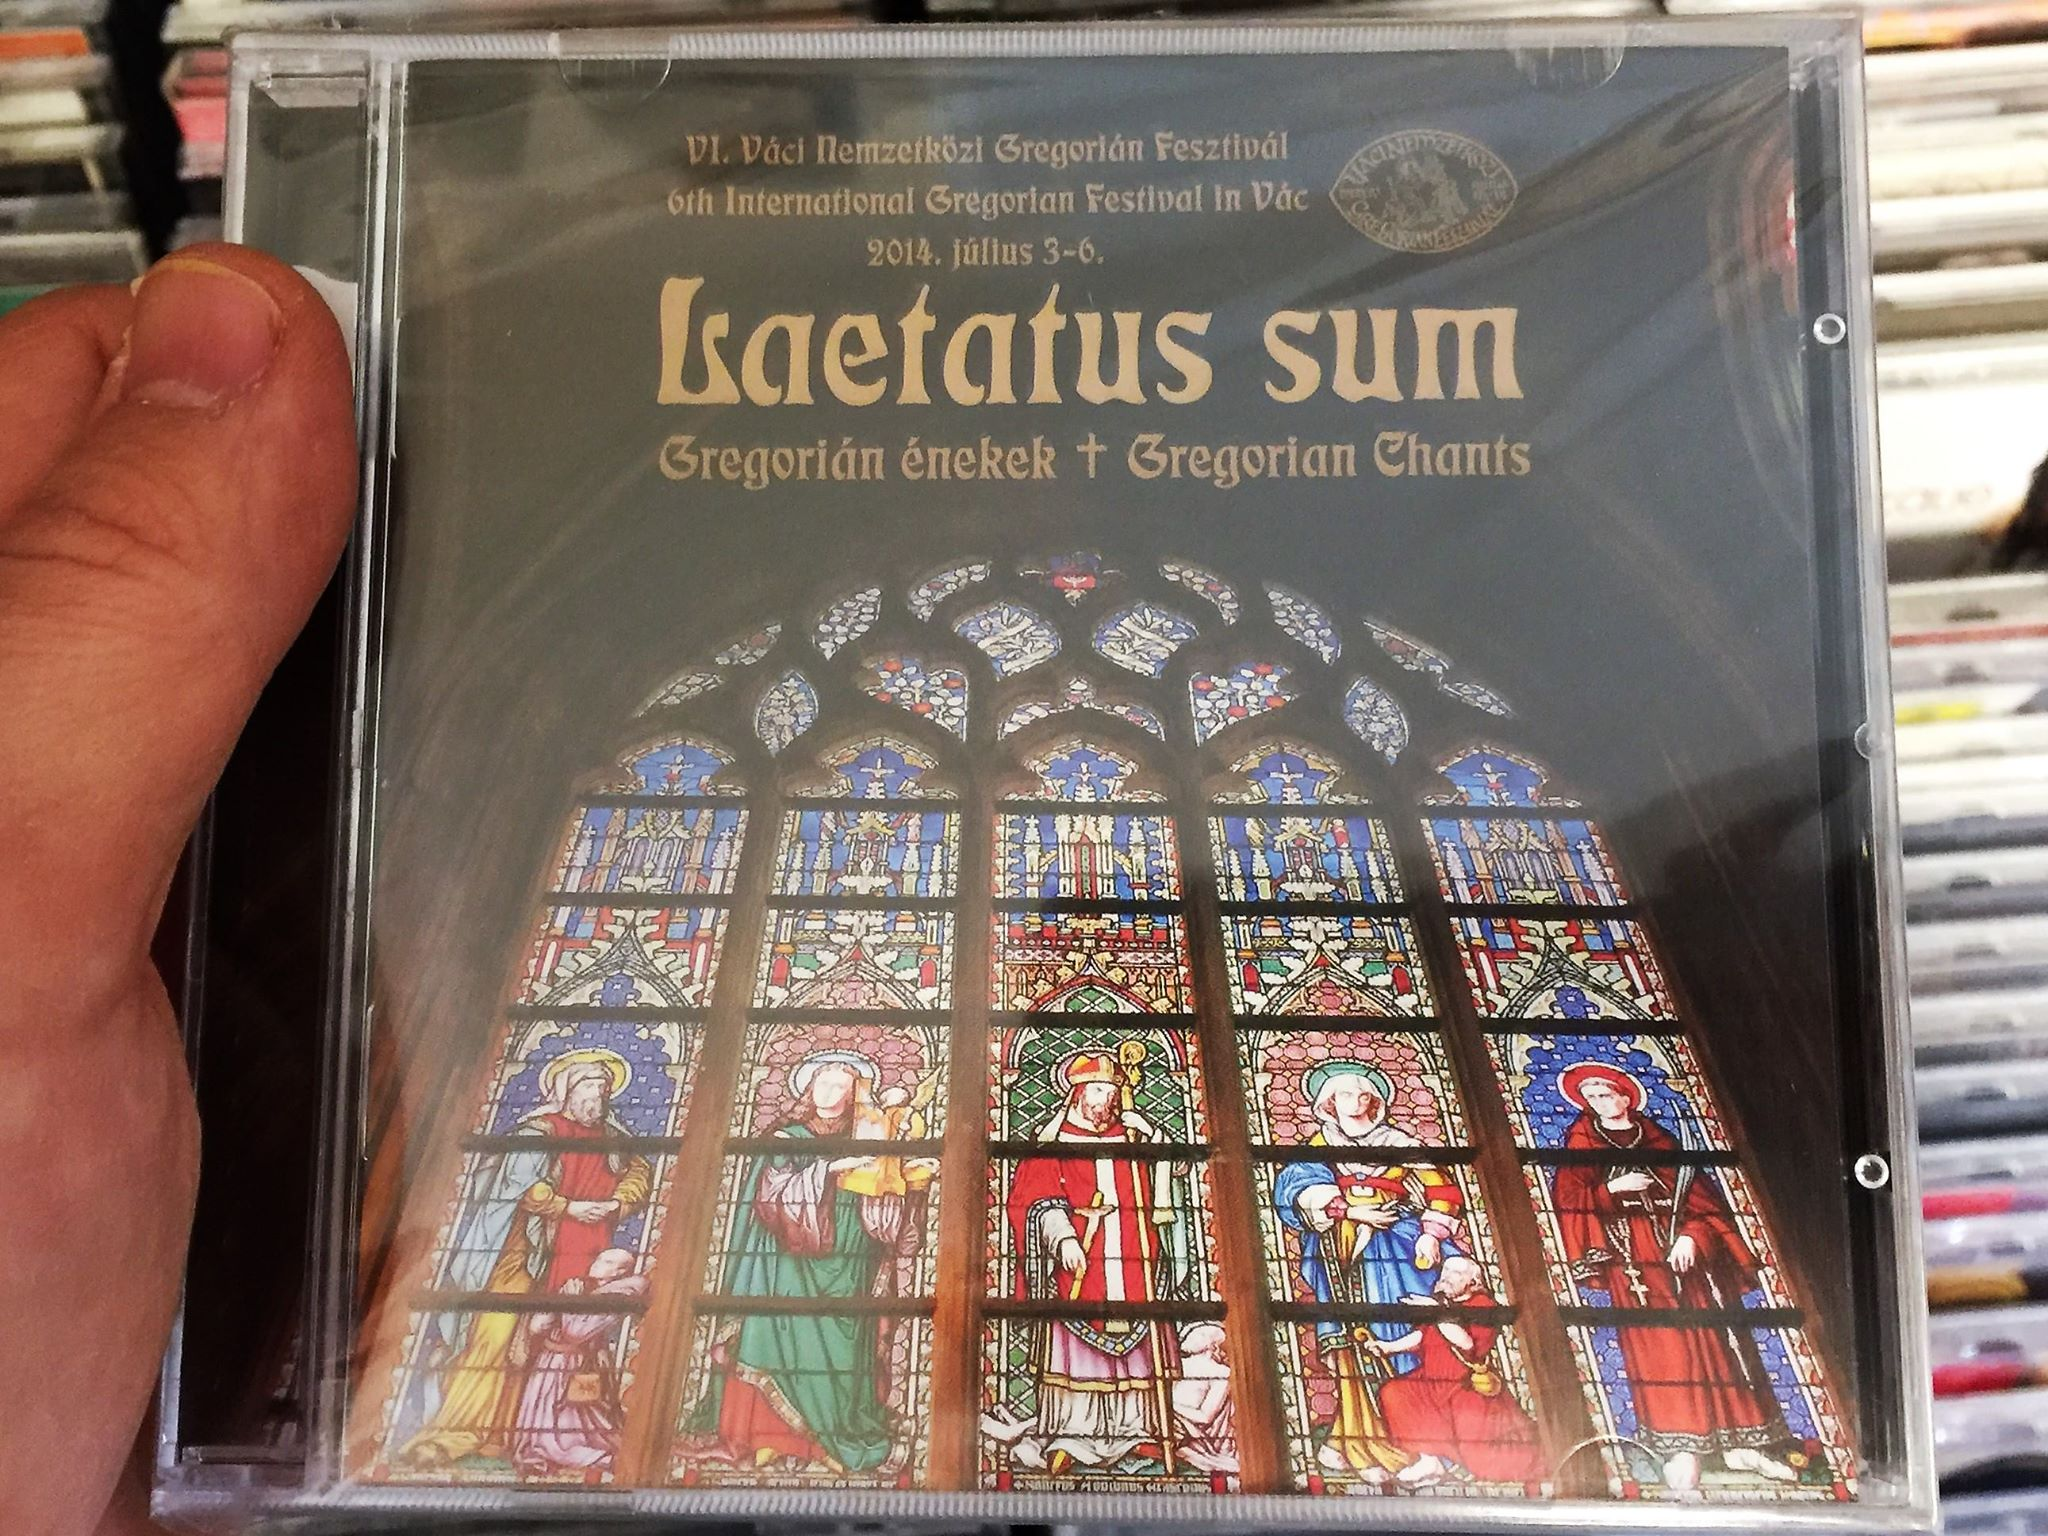 laetatus-sum-gregori-n-nekek-gregorian-chants-6th-international-gregorian-festival-in-v-c-hungarian-cd-2015-1-.jpg